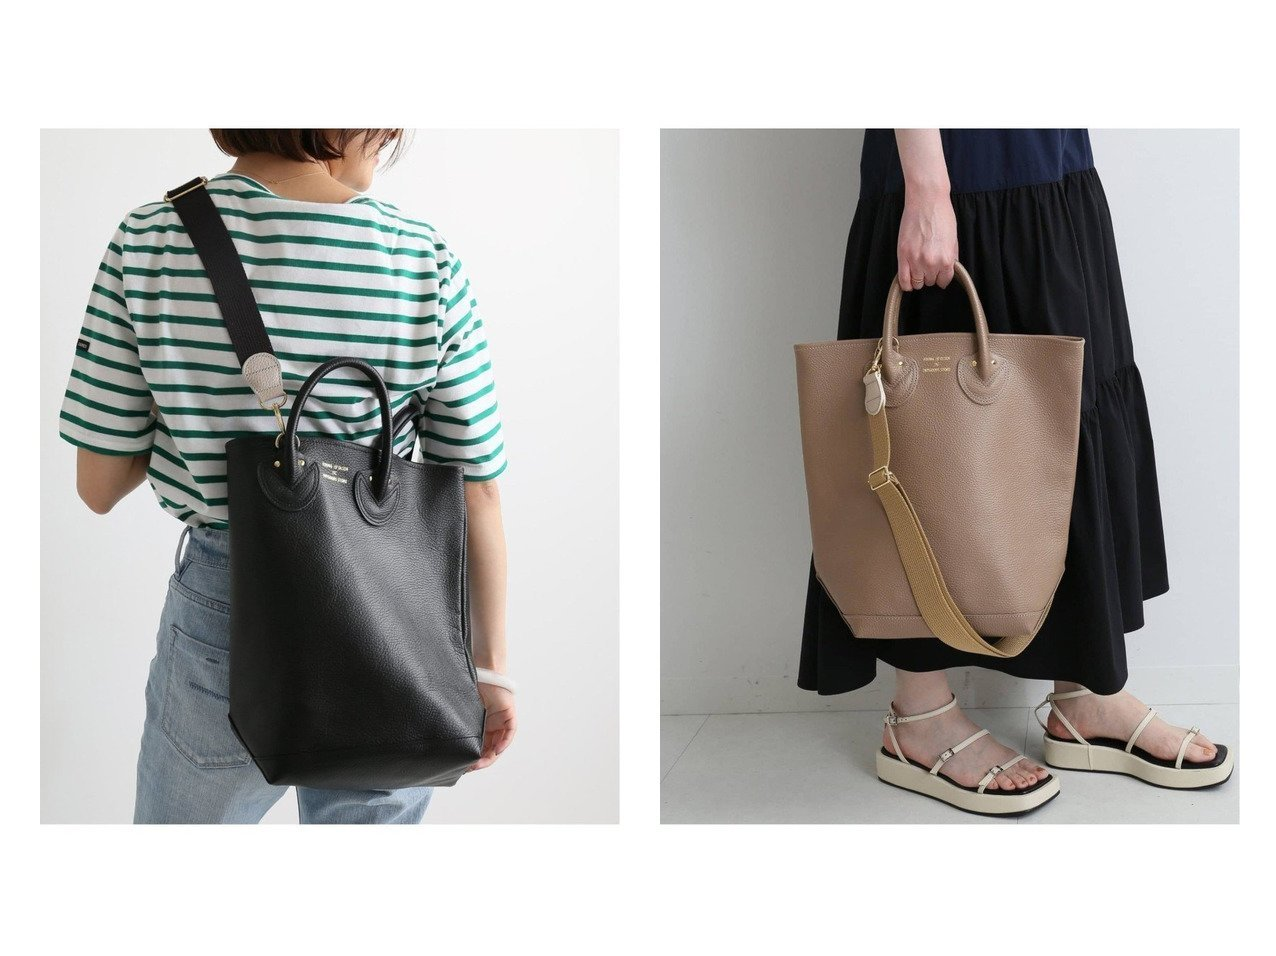 【IENA/イエナ】の【ヤングアンドオルセン】EMBOSSED LEATHER HAVERSACK 【バッグ・鞄】おすすめ!人気、トレンド・レディースファッションの通販 おすすめで人気の流行・トレンド、ファッションの通販商品 インテリア・家具・メンズファッション・キッズファッション・レディースファッション・服の通販 founy(ファニー) https://founy.com/ ファッション Fashion レディースファッション WOMEN バッグ Bag NEW・新作・新着・新入荷 New Arrivals 再入荷 Restock/Back in Stock/Re Arrival  ID:crp329100000065099